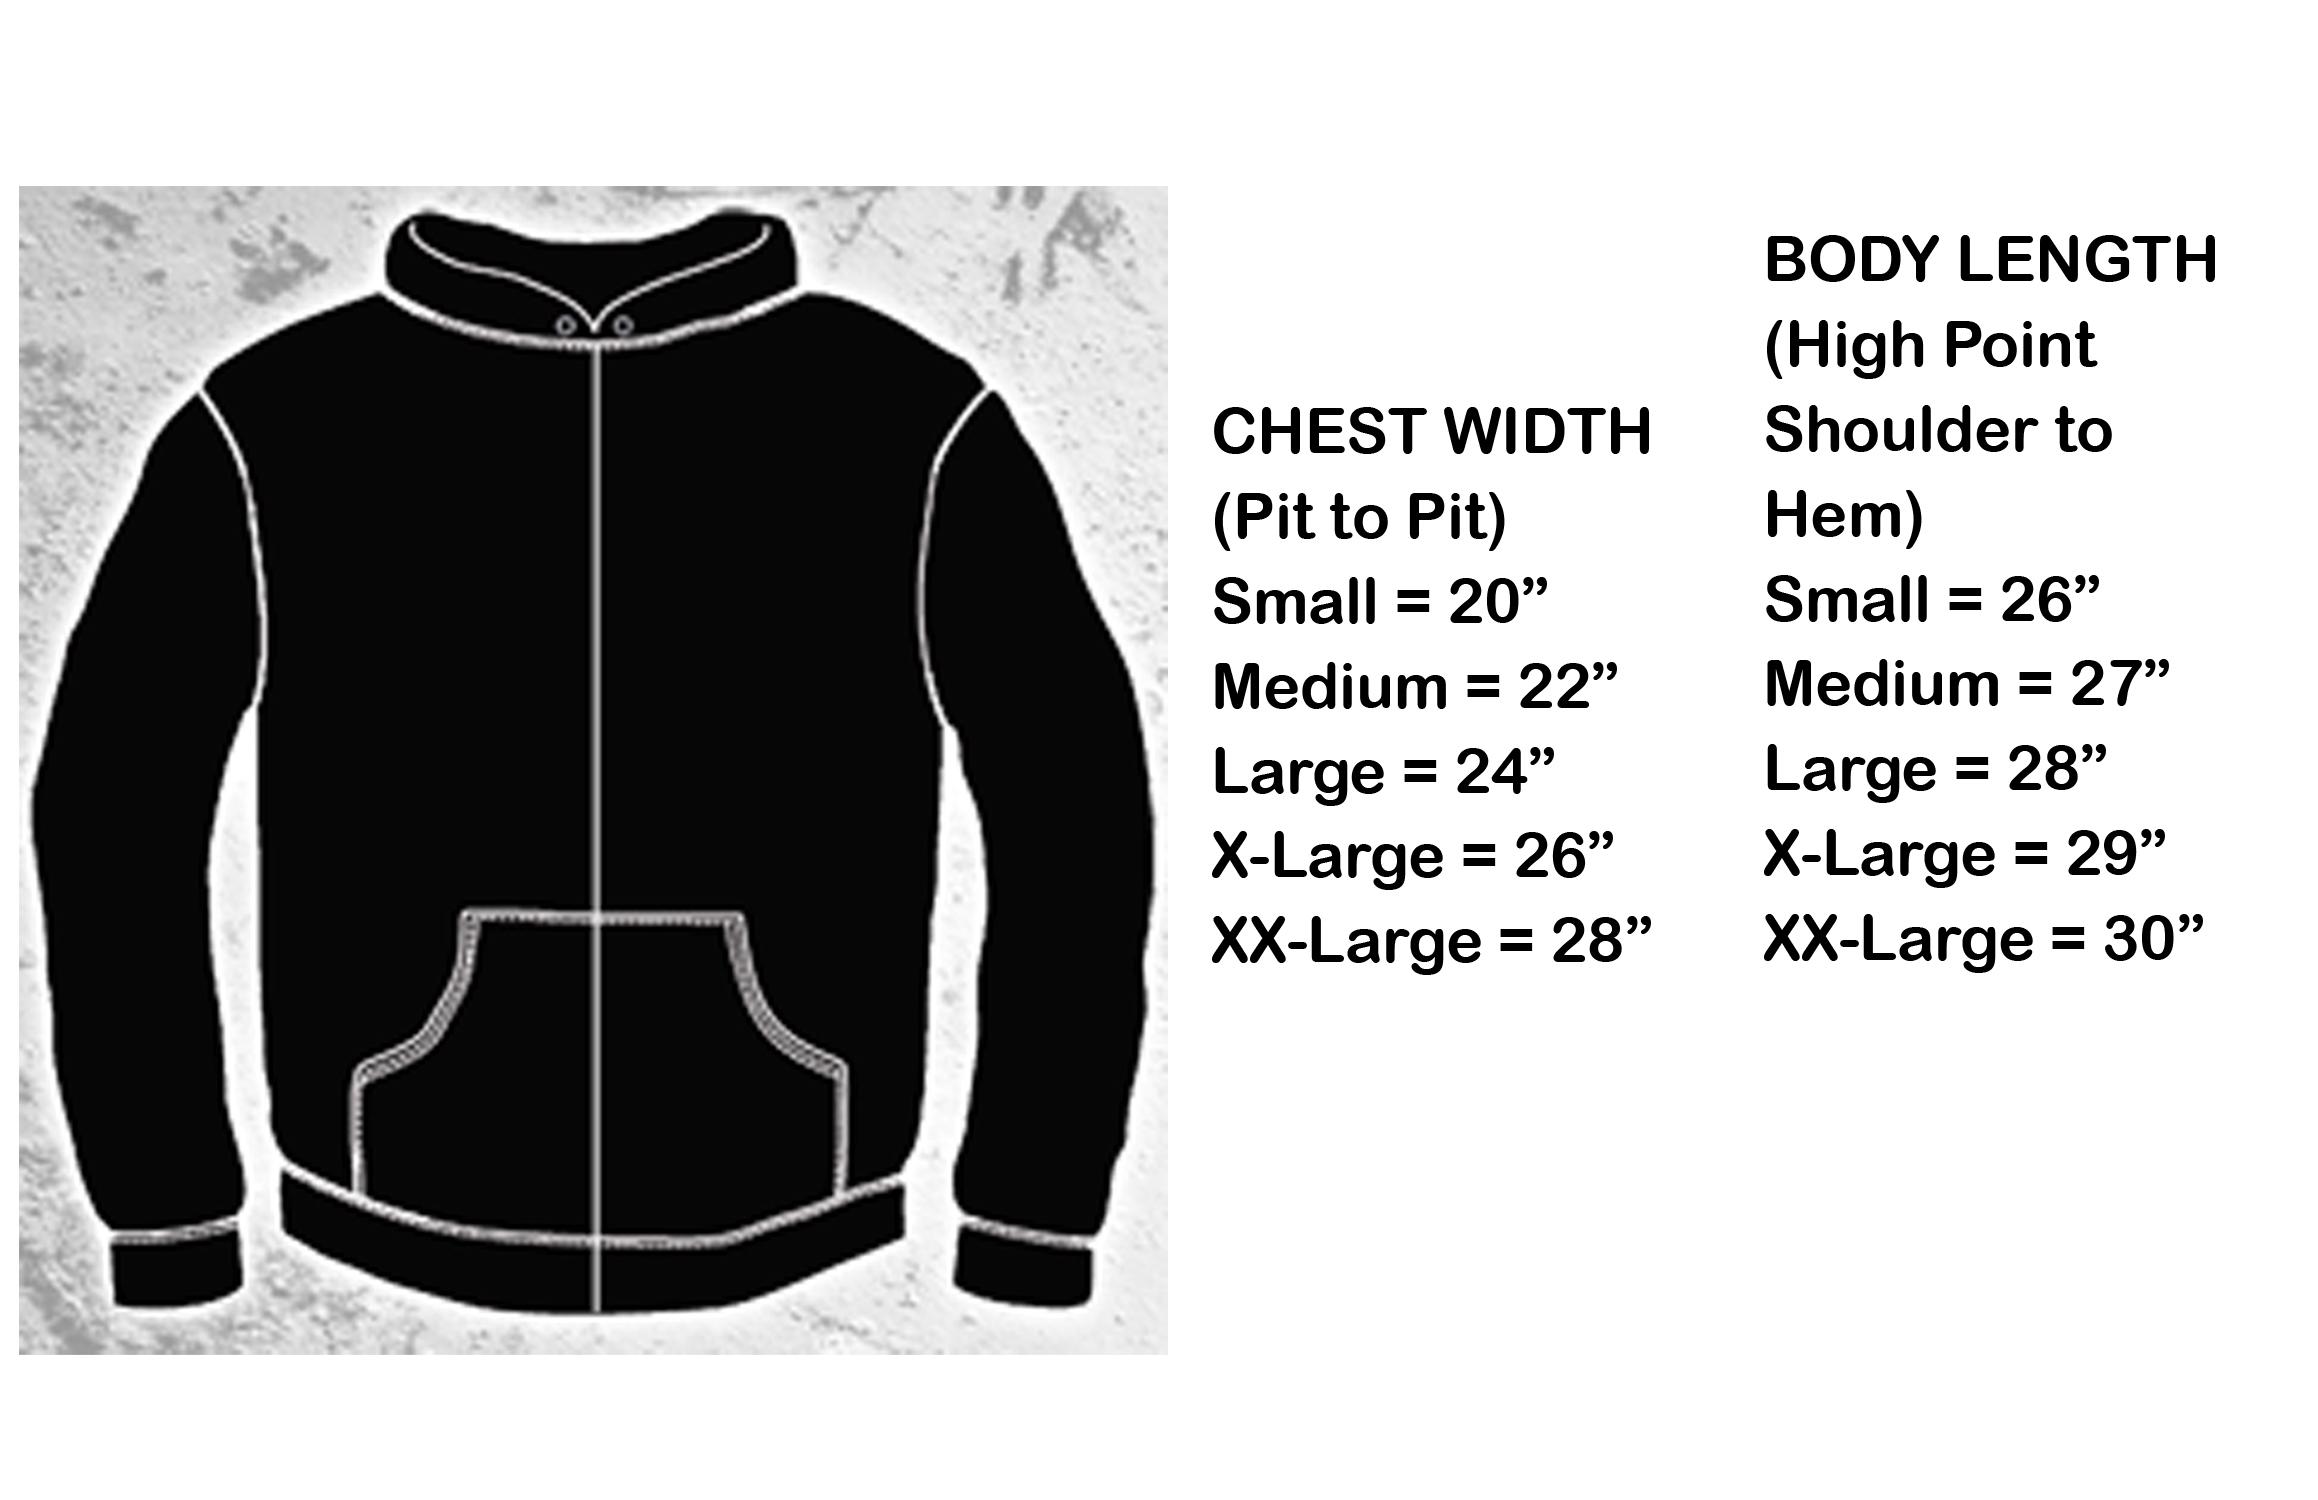 I Heart Analogue Vintage Slr Camera Sweat Shirt Pullover Hoodie Diagram Thumbnail 1